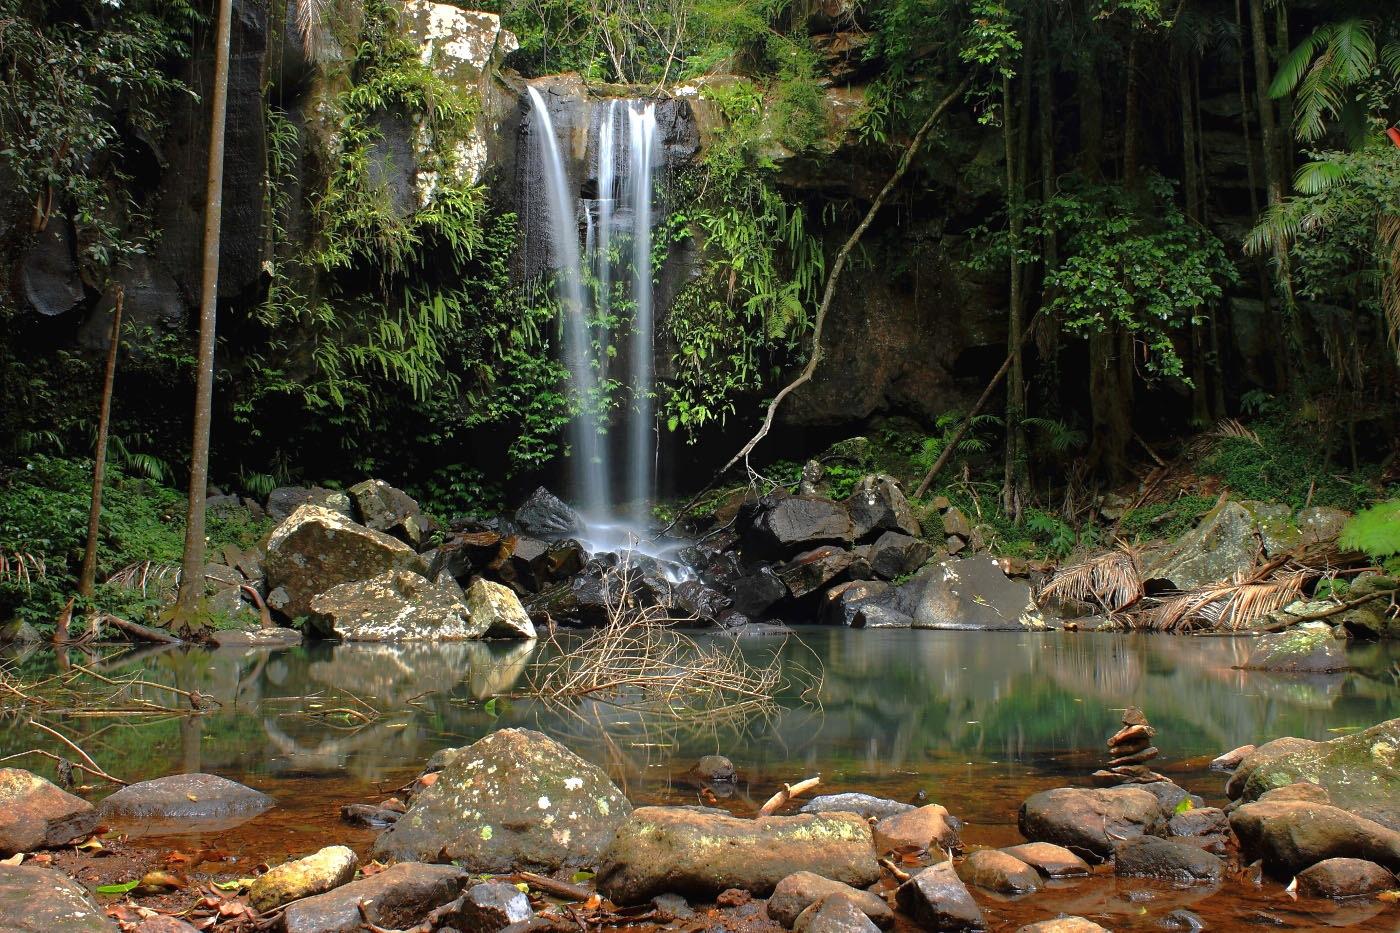 Chasing waterfalls by Petra S El